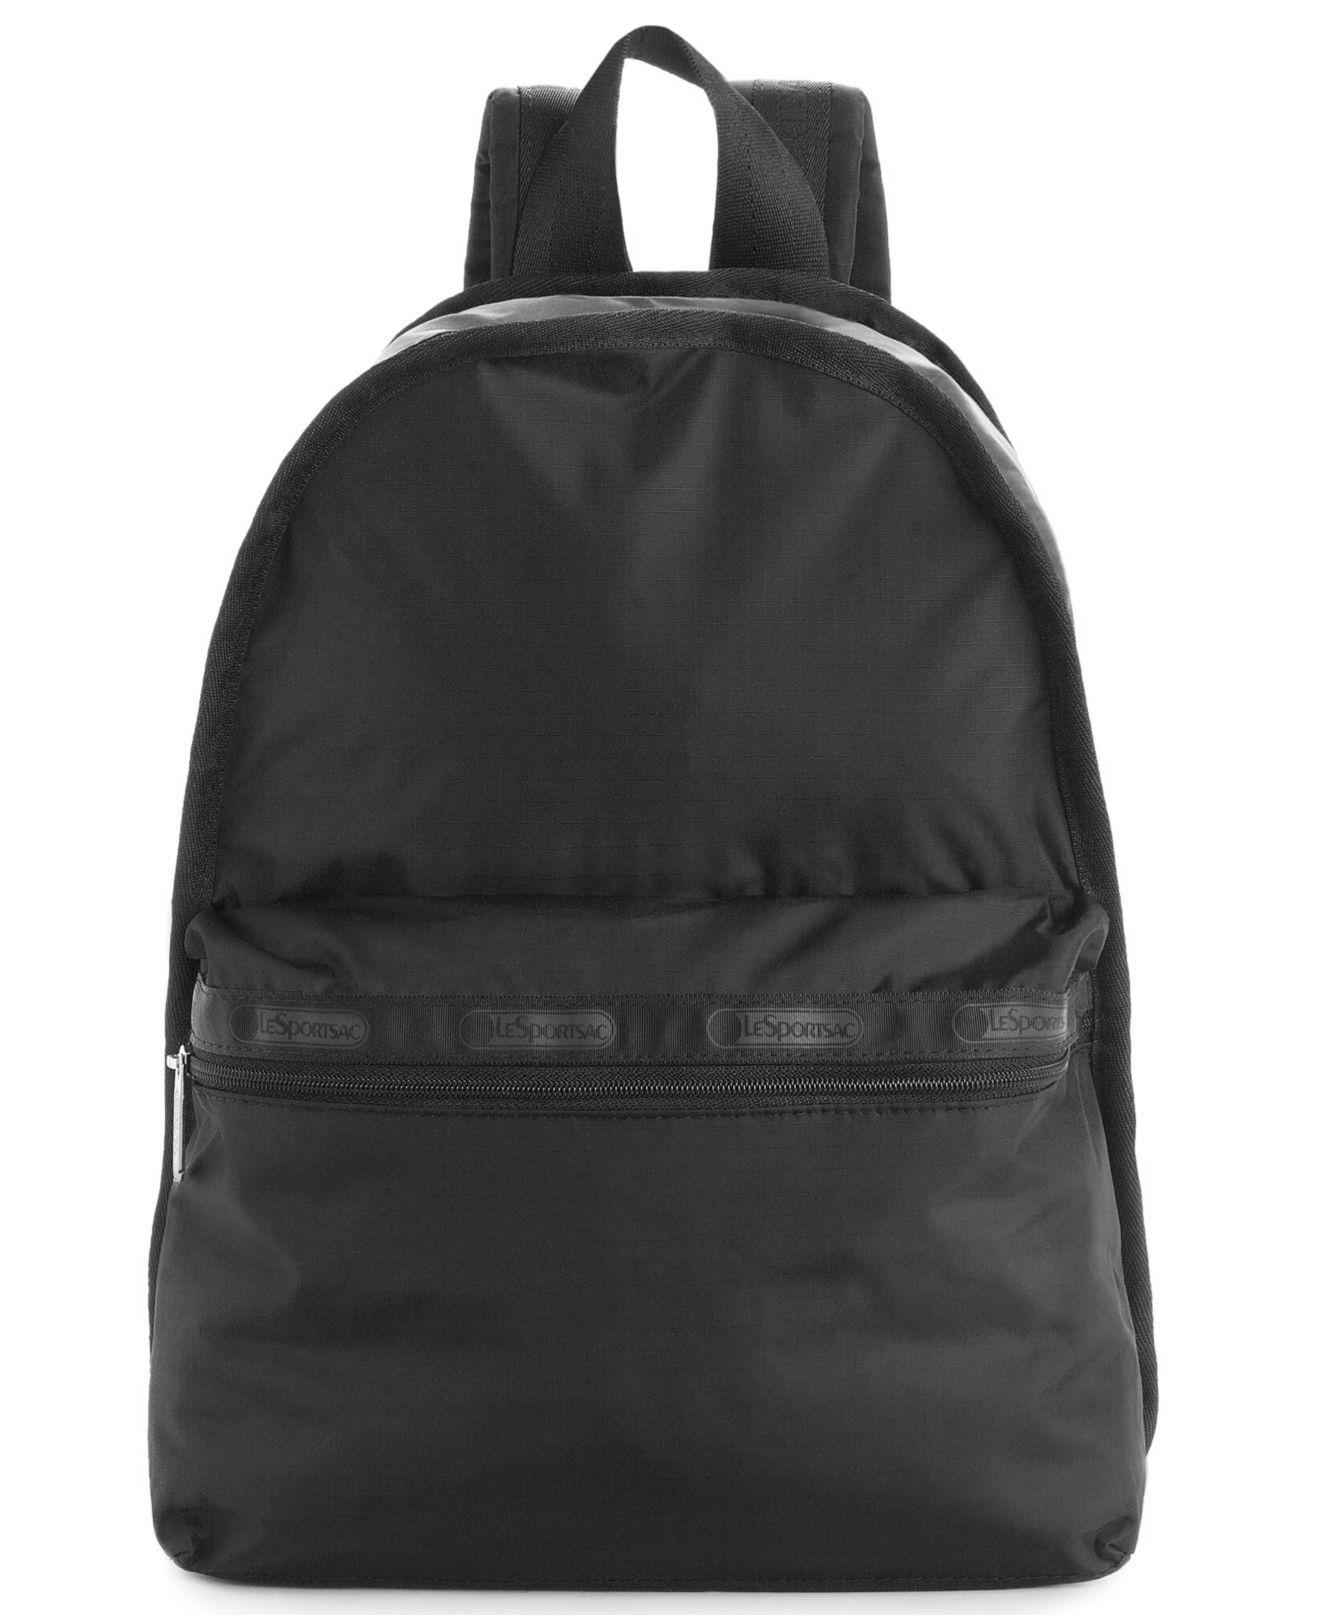 Lesportsac Basic Backpack in Black